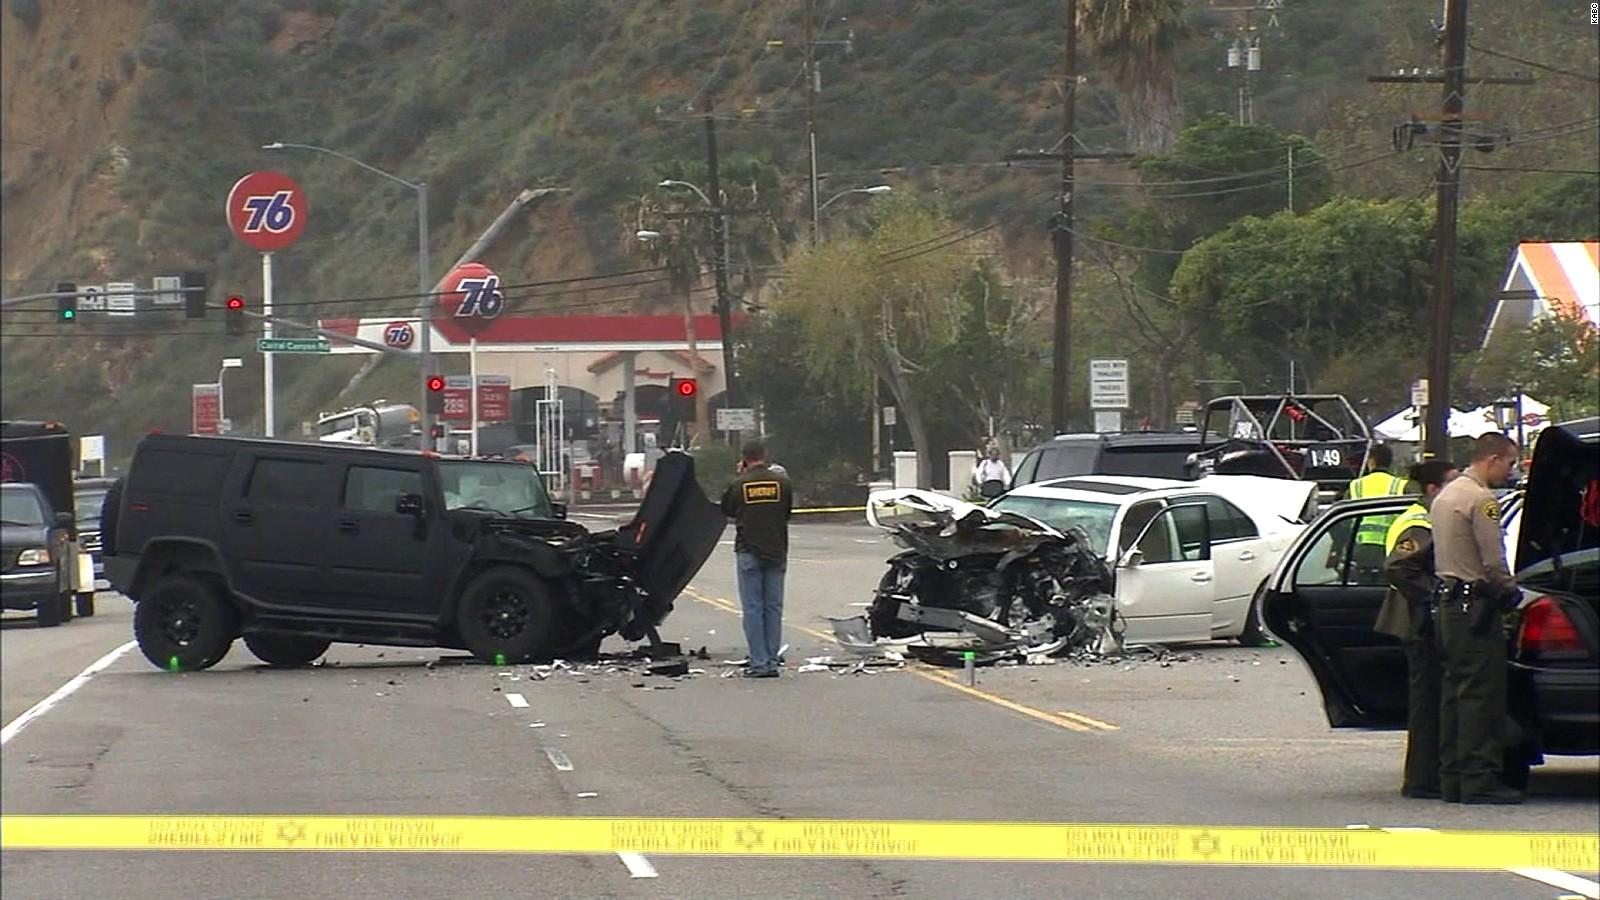 1 dead in car crash involving Bruce Jenner - CNN Video